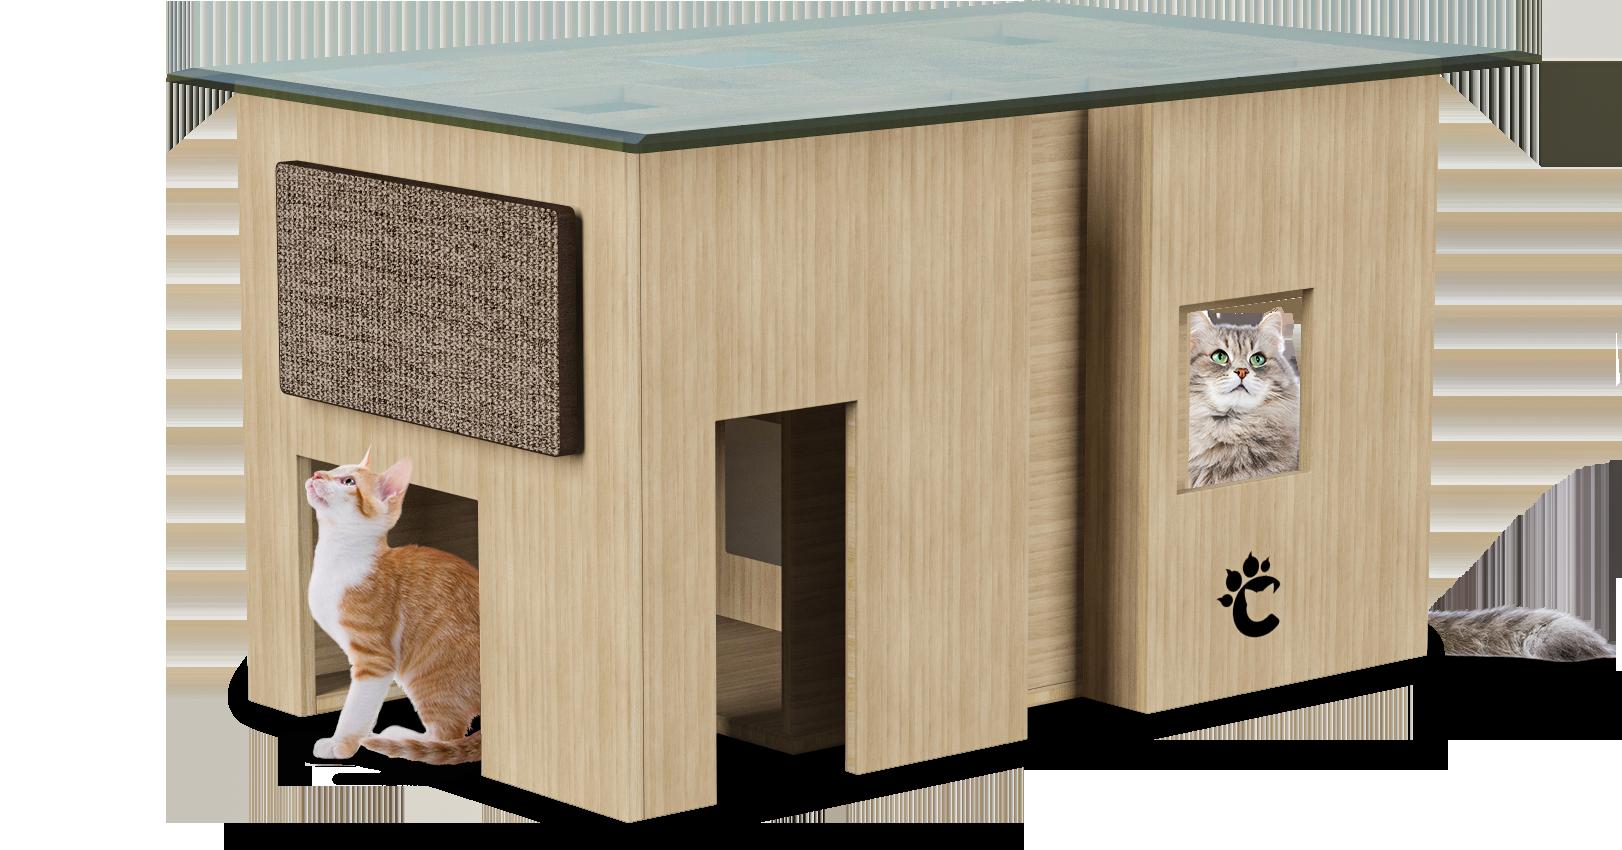 3D Rendering for Clawz Modern Cat Furniture